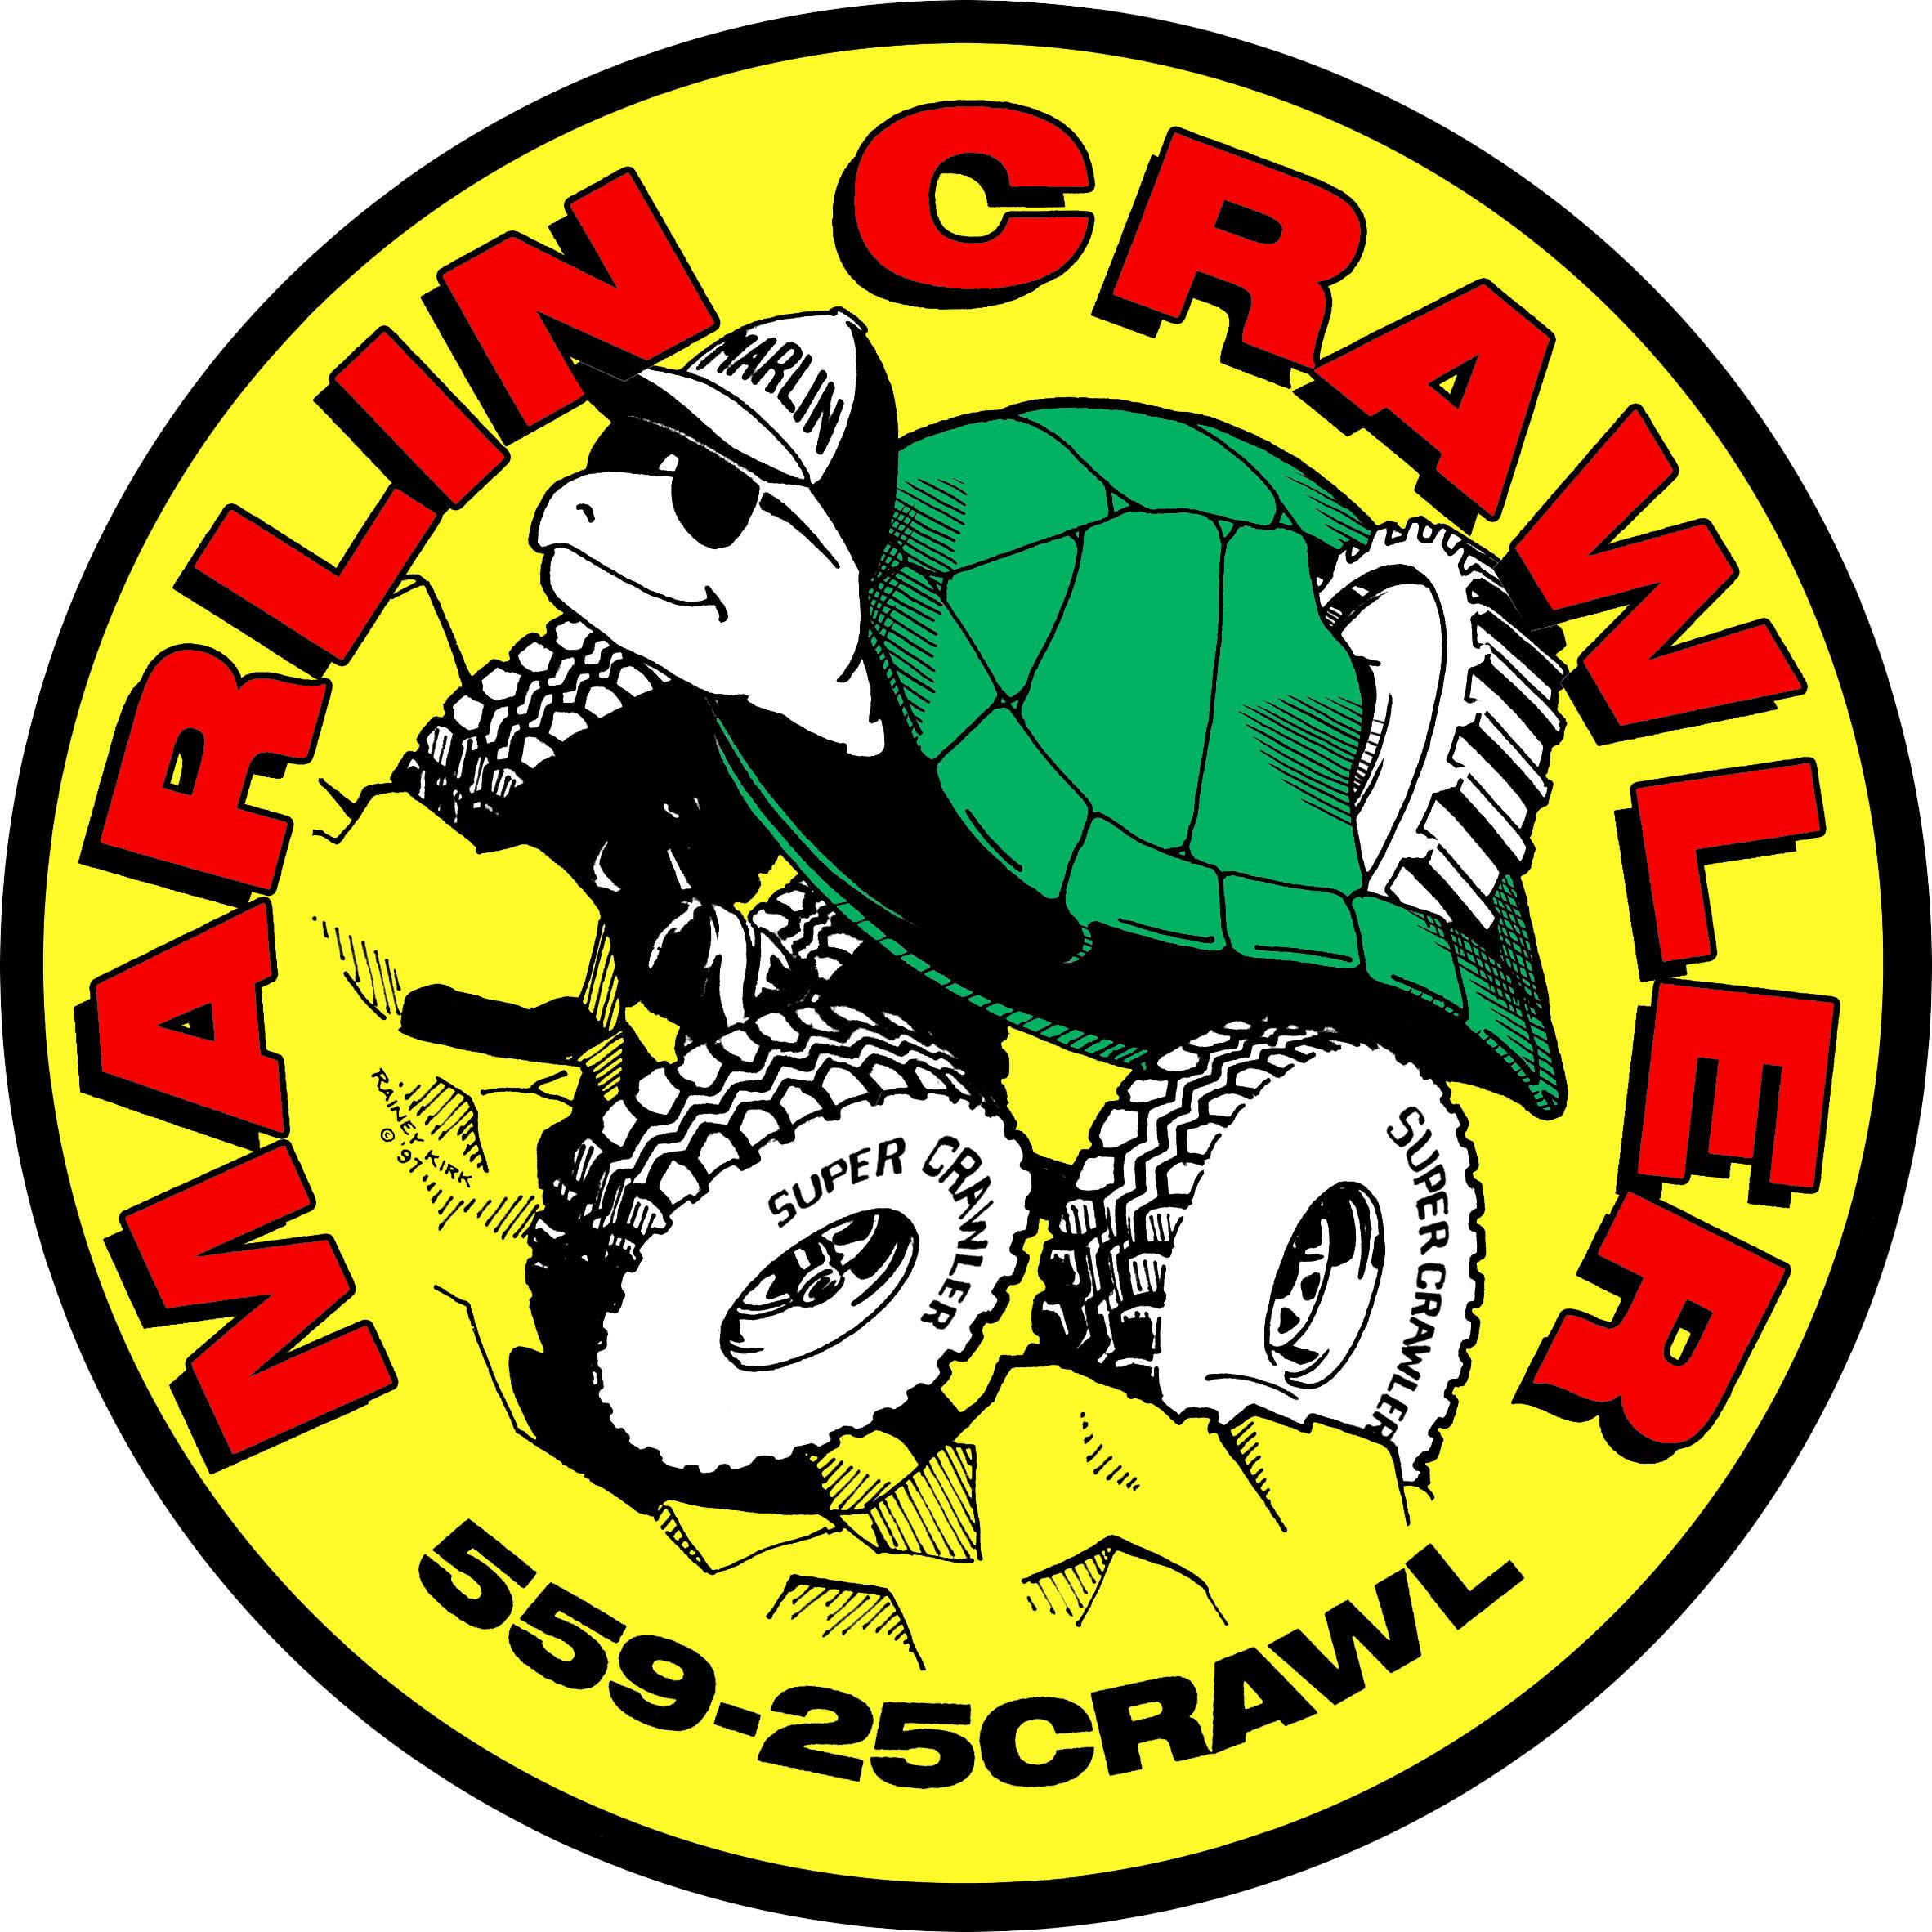 https://www.beadlok.com/Logo/Marlin%20Crawler%20-%20Turtle%20Logo.jpg